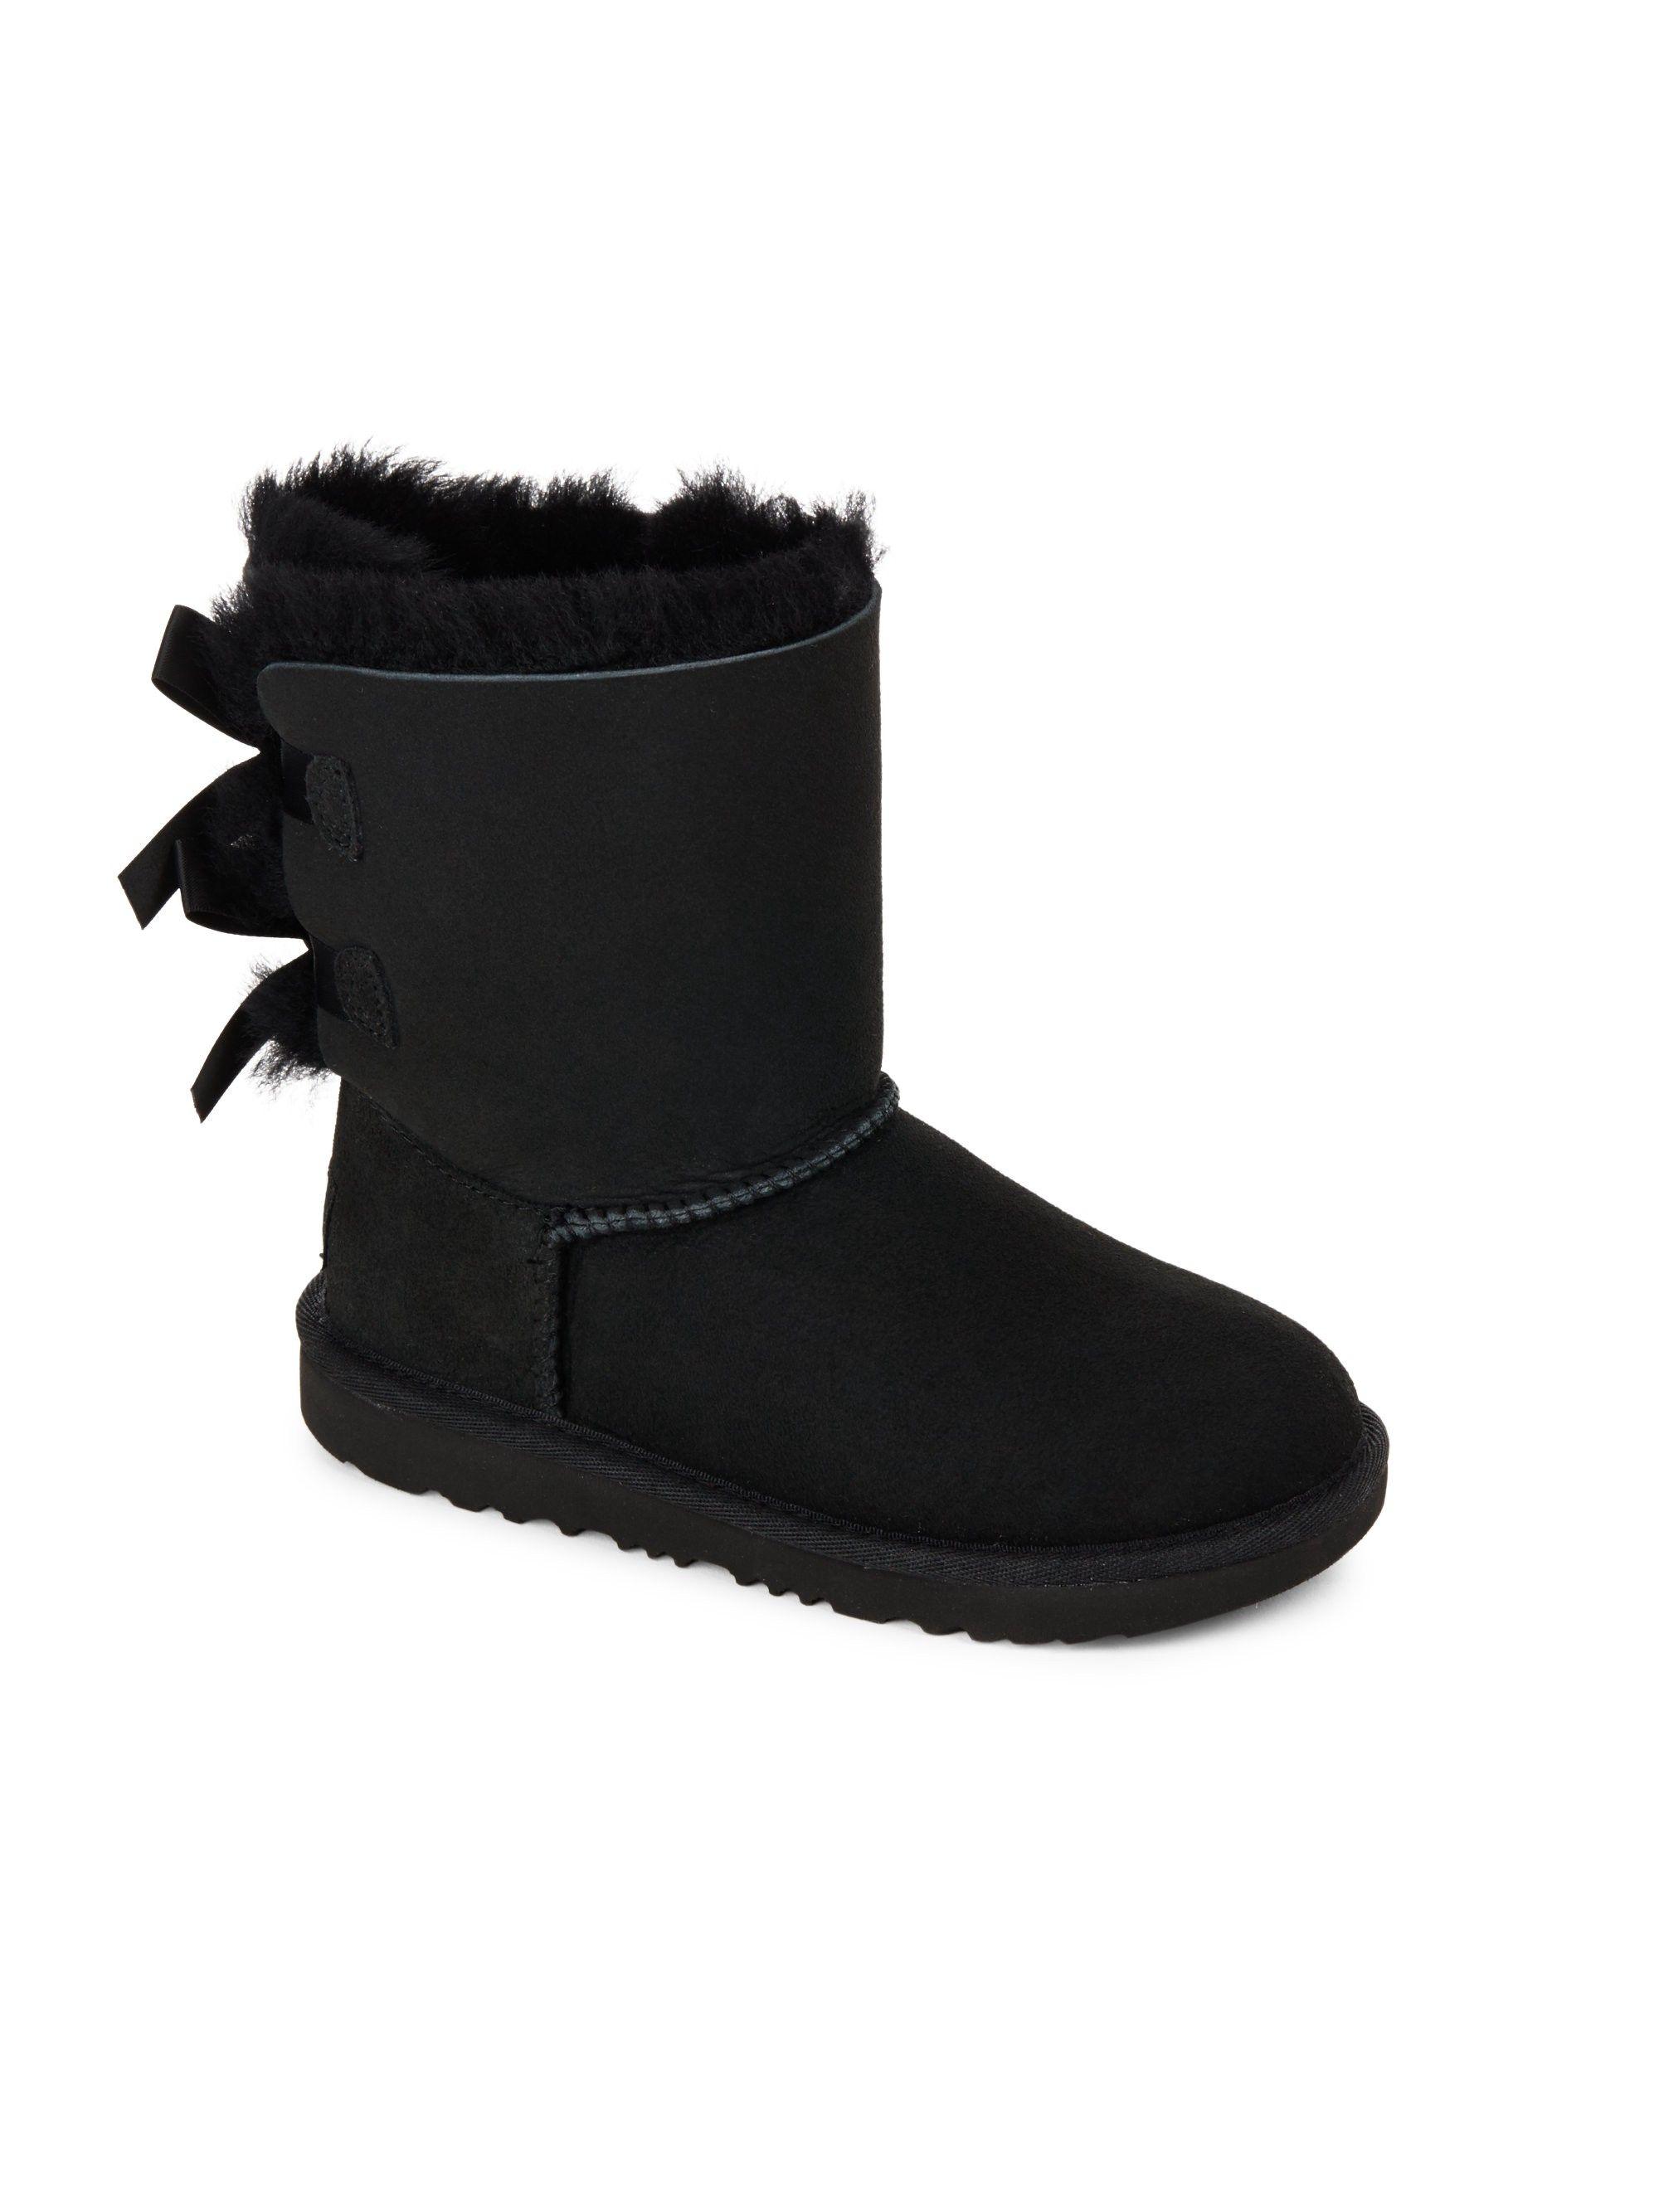 2ab1a2e7ad2 Ugg Australia Kids' Bailey Bow II Boots - Chestnut 13 (Child ...